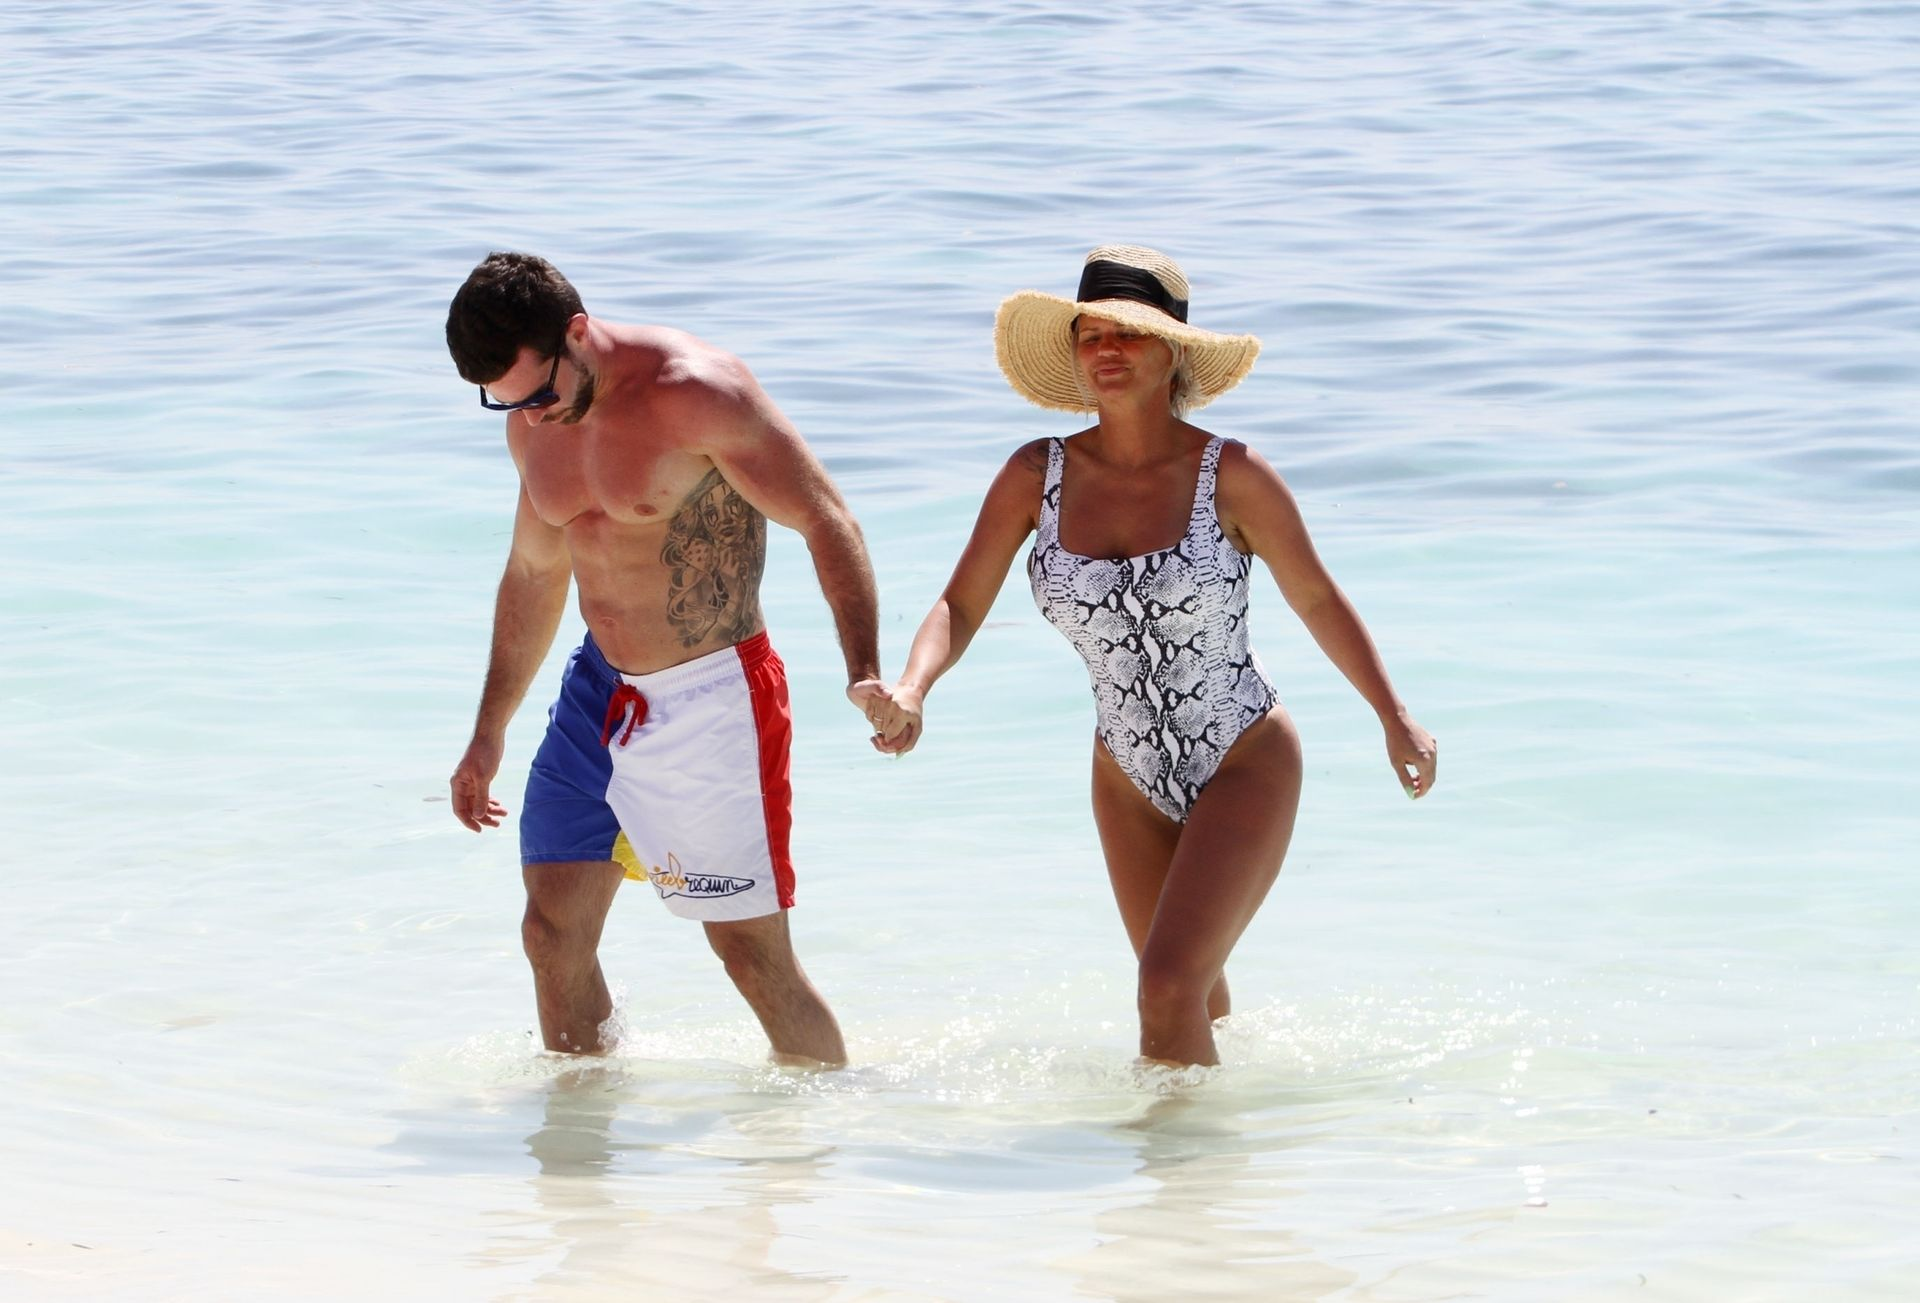 Kerry Katona & Ryan Mahoney Hit The Beach On Holiday At Their Luxury 5 Star Resort Ayada Maldives 0015